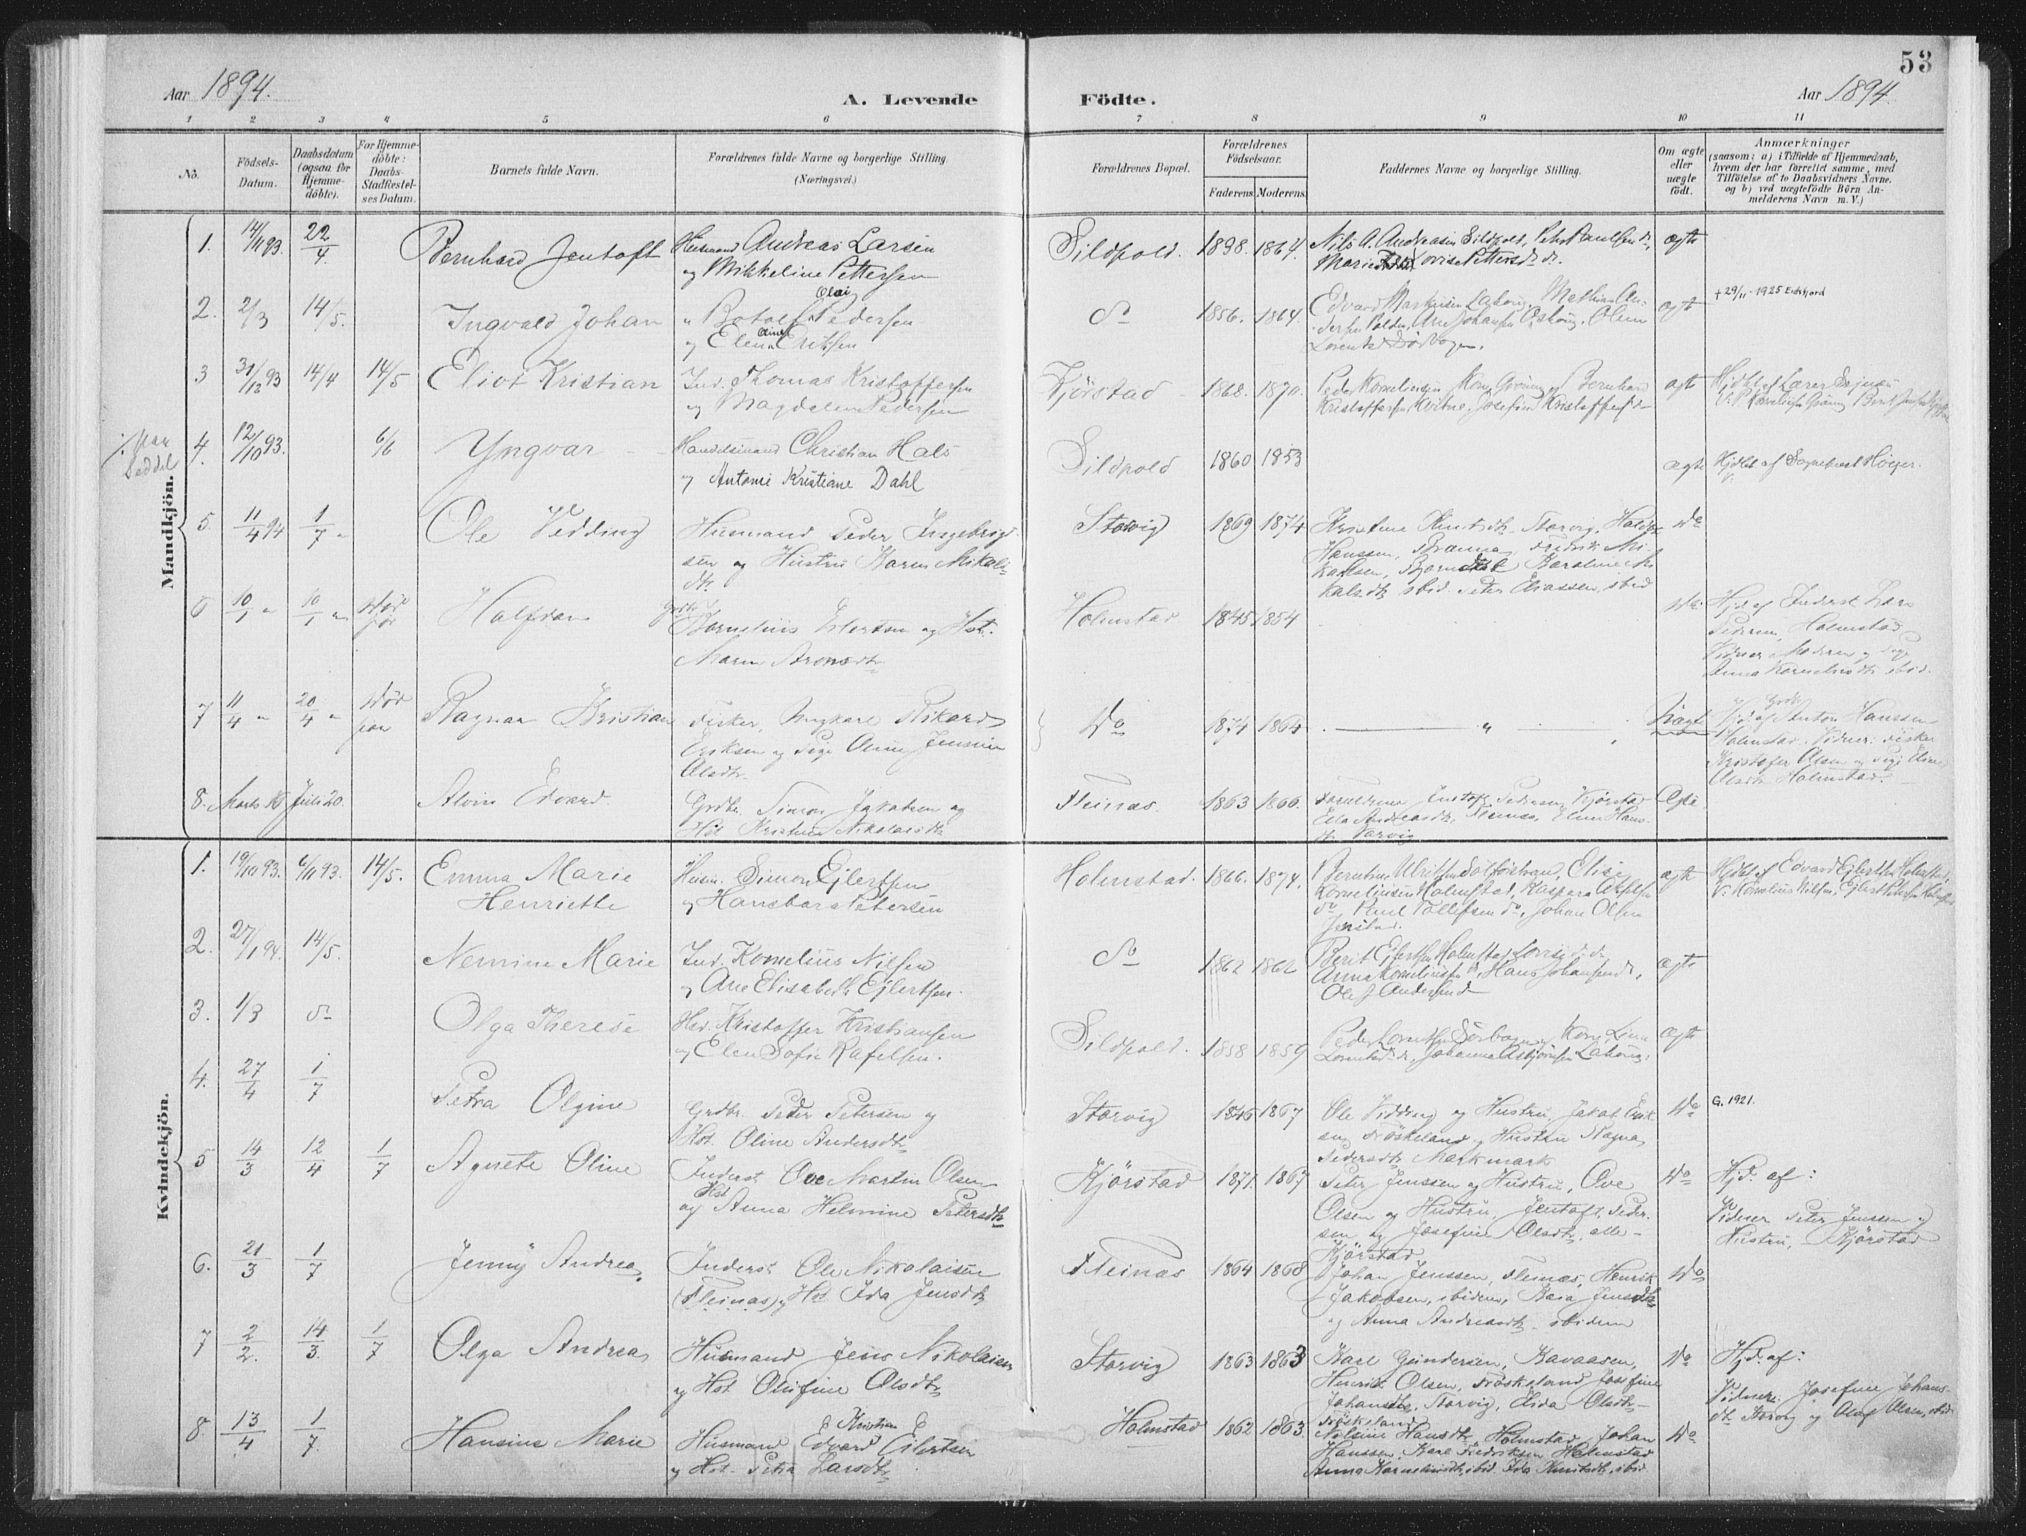 SAT, Ministerialprotokoller, klokkerbøker og fødselsregistre - Nordland, 890/L1286: Ministerialbok nr. 890A01, 1882-1902, s. 53